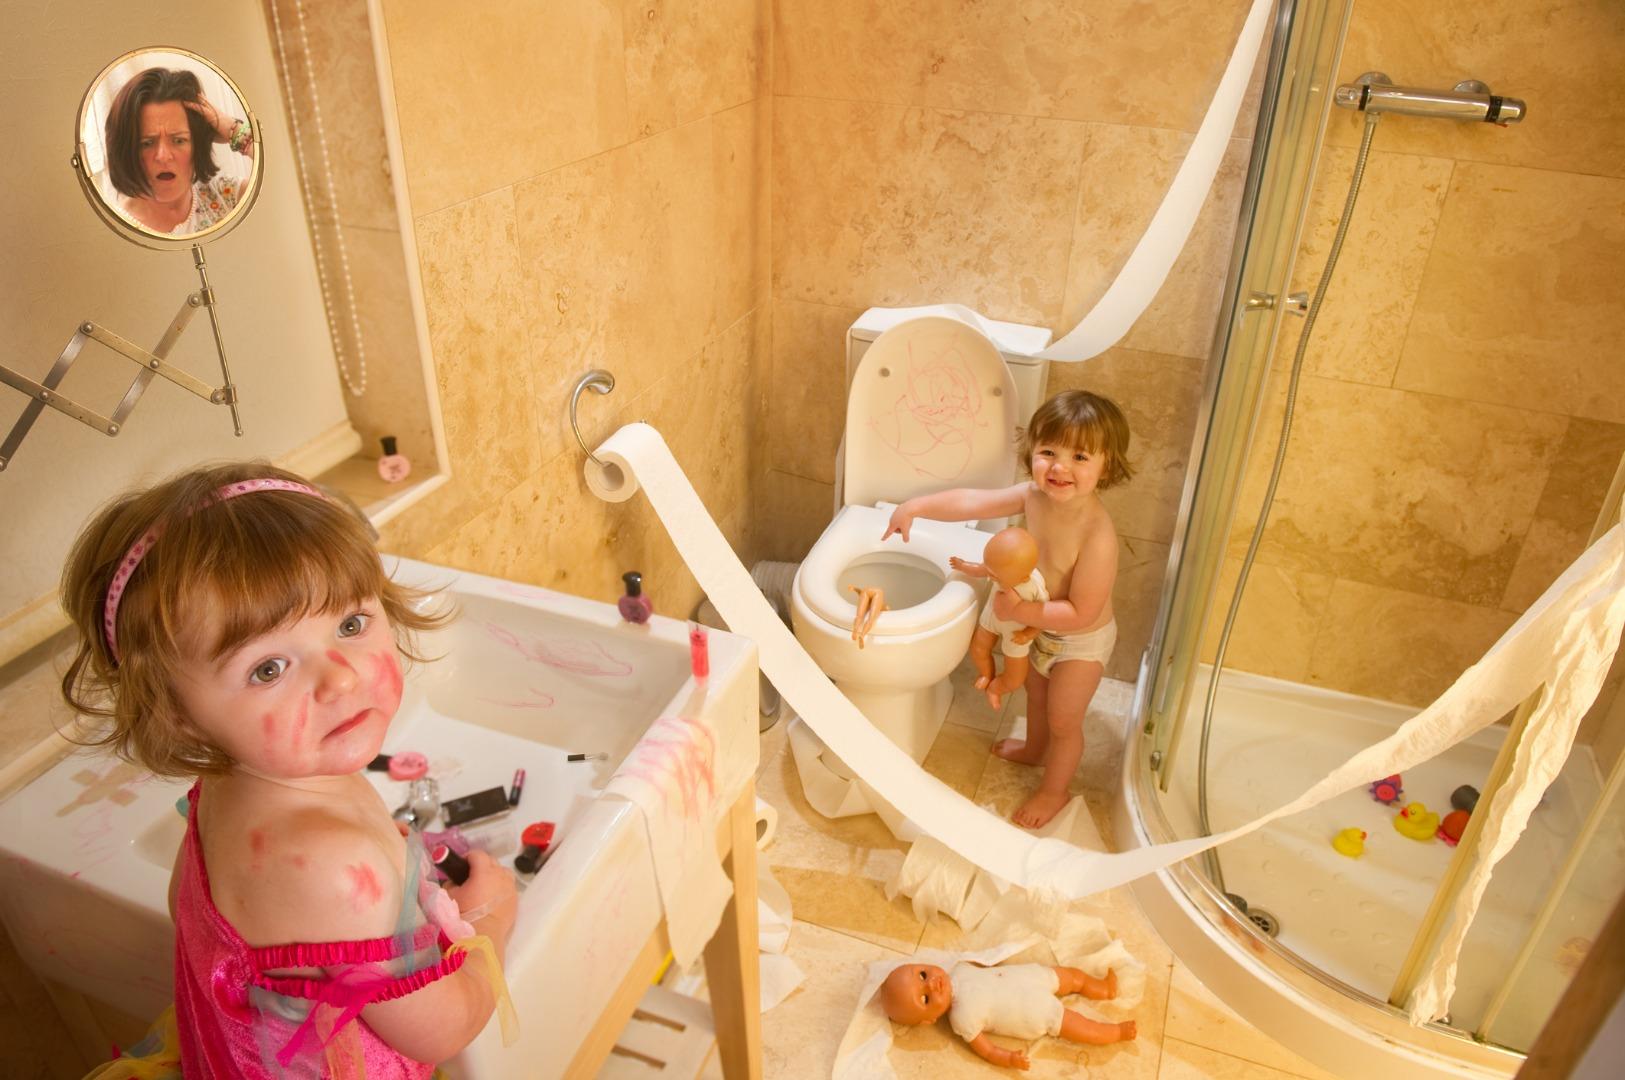 Home alone: how to prepare a child?